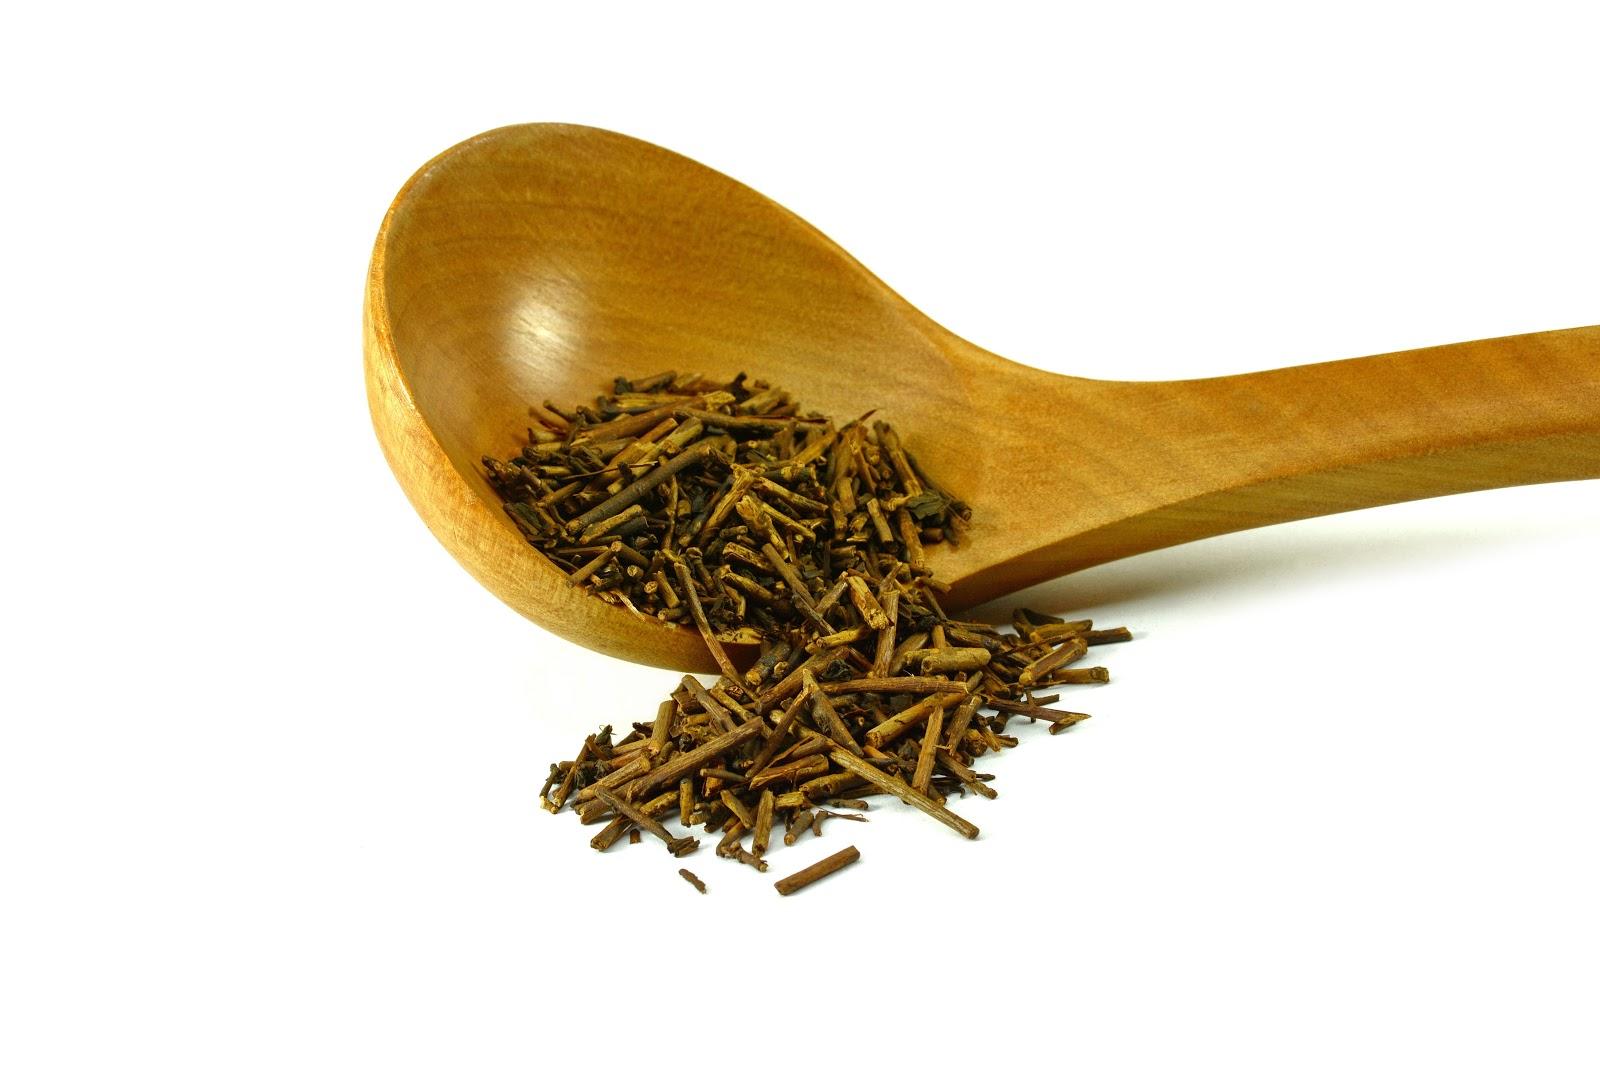 kukicha tea in spoon